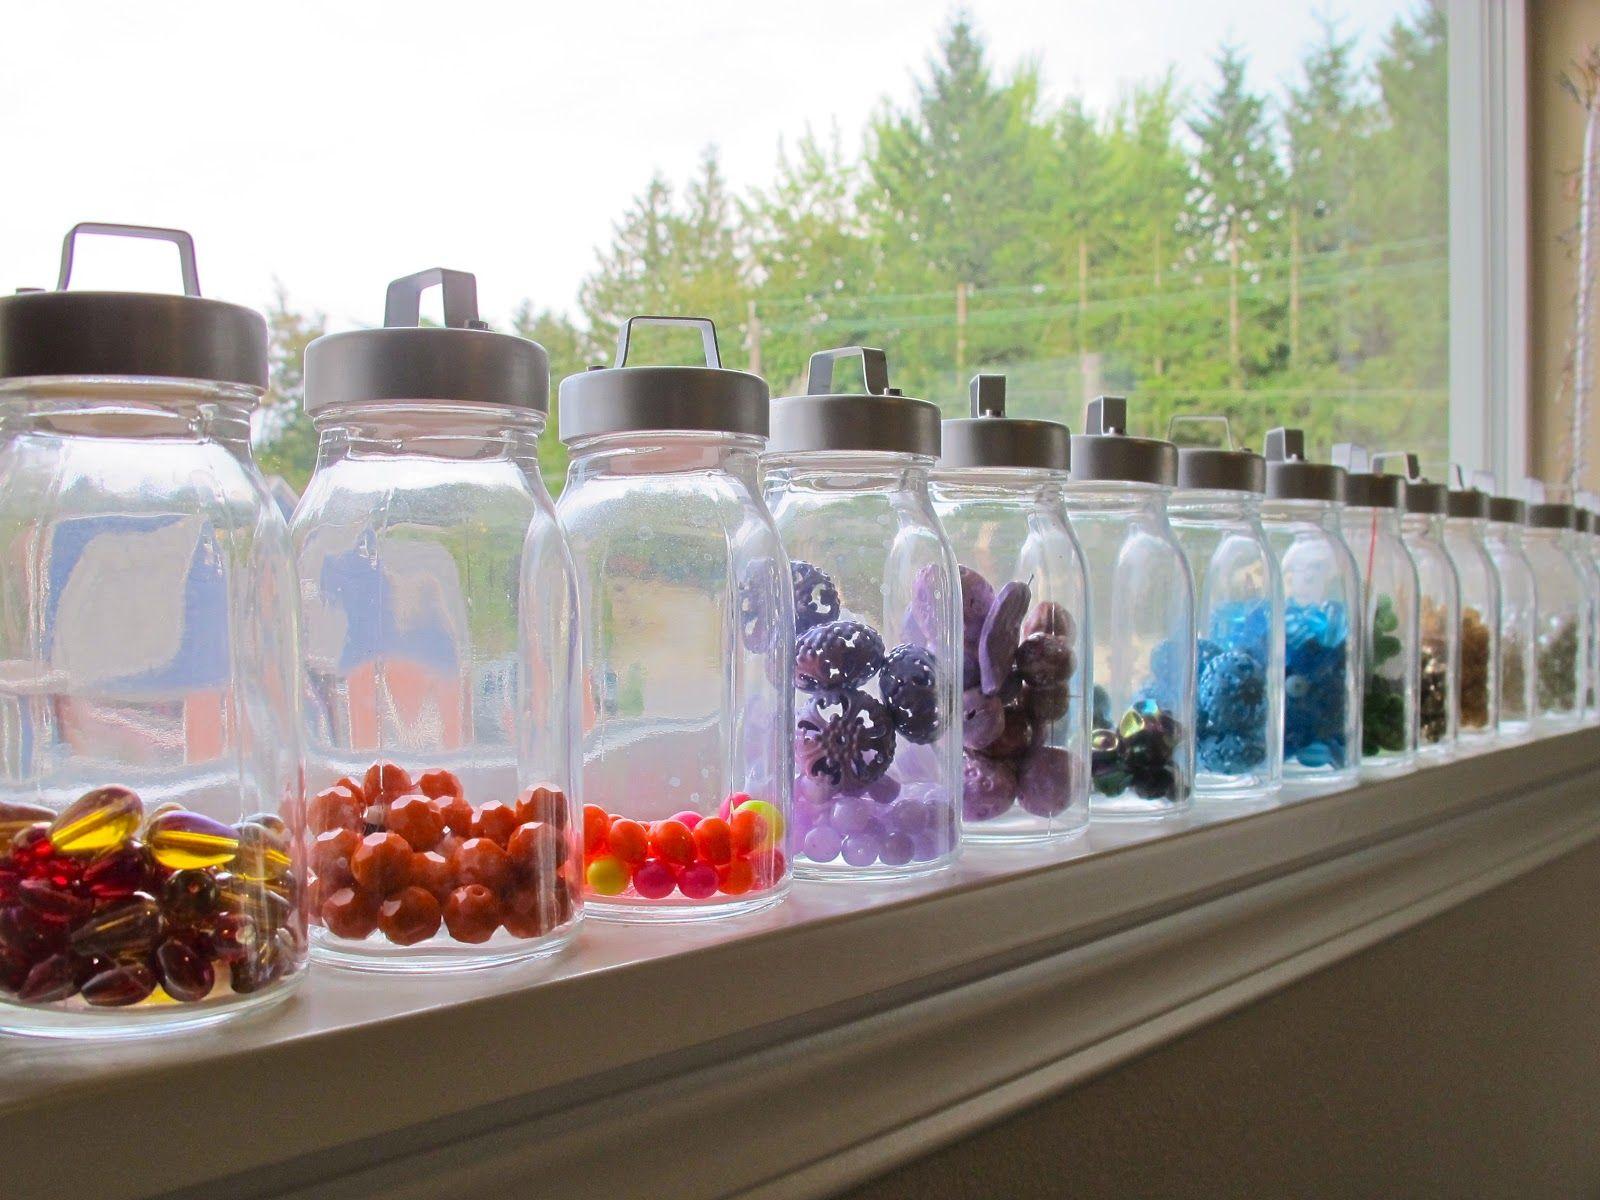 bead storage in old Ikea spice jars